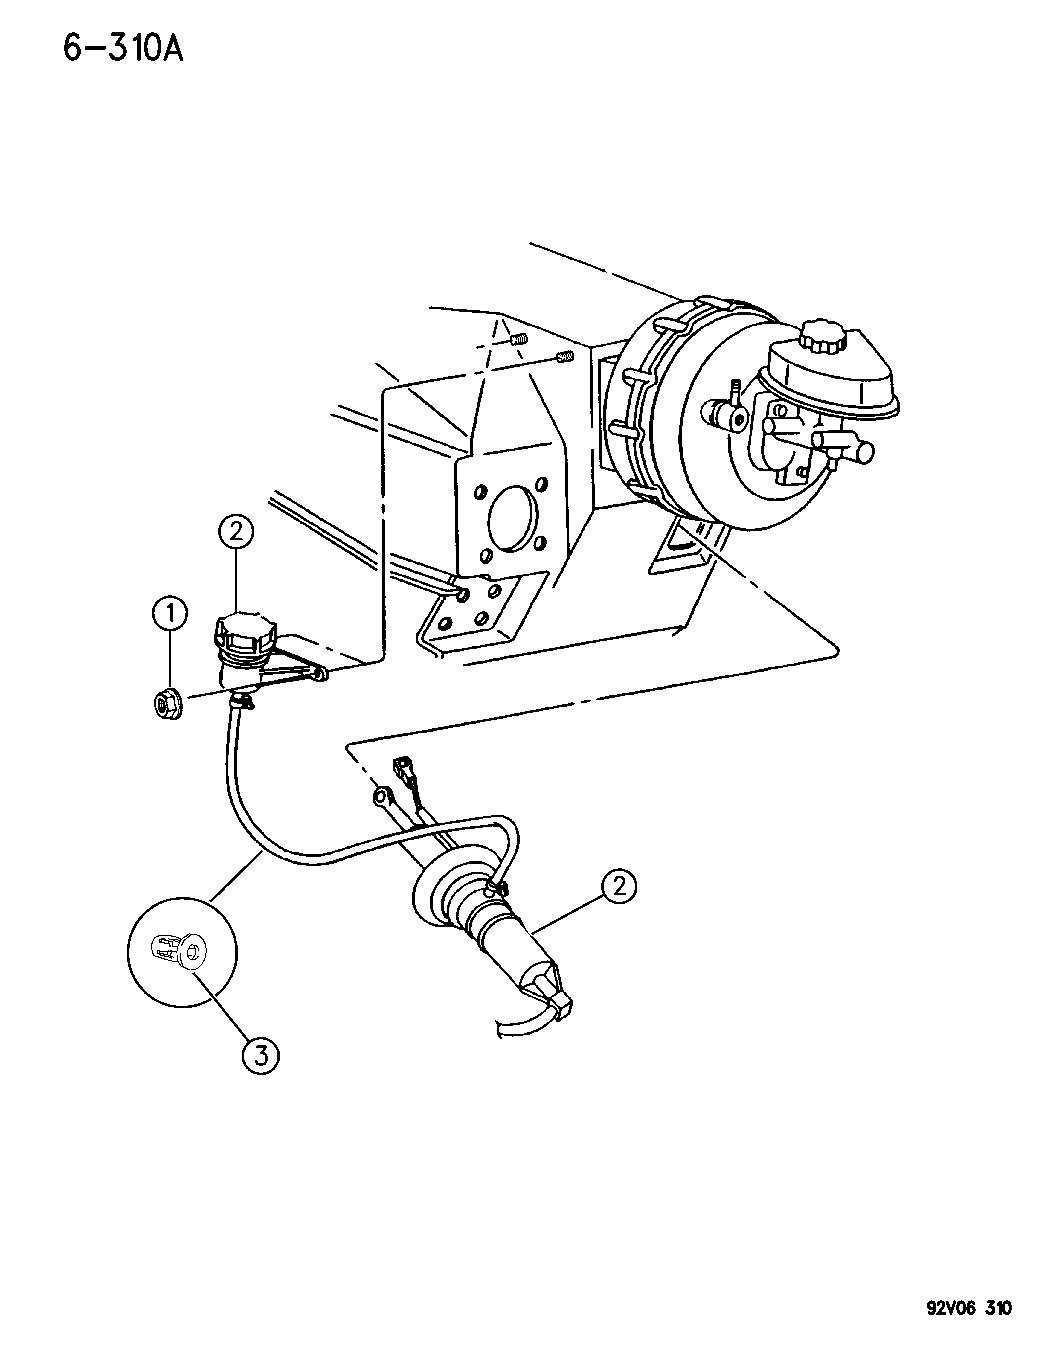 Dodge Viper Actuator Hydraulic Clutch Actuation